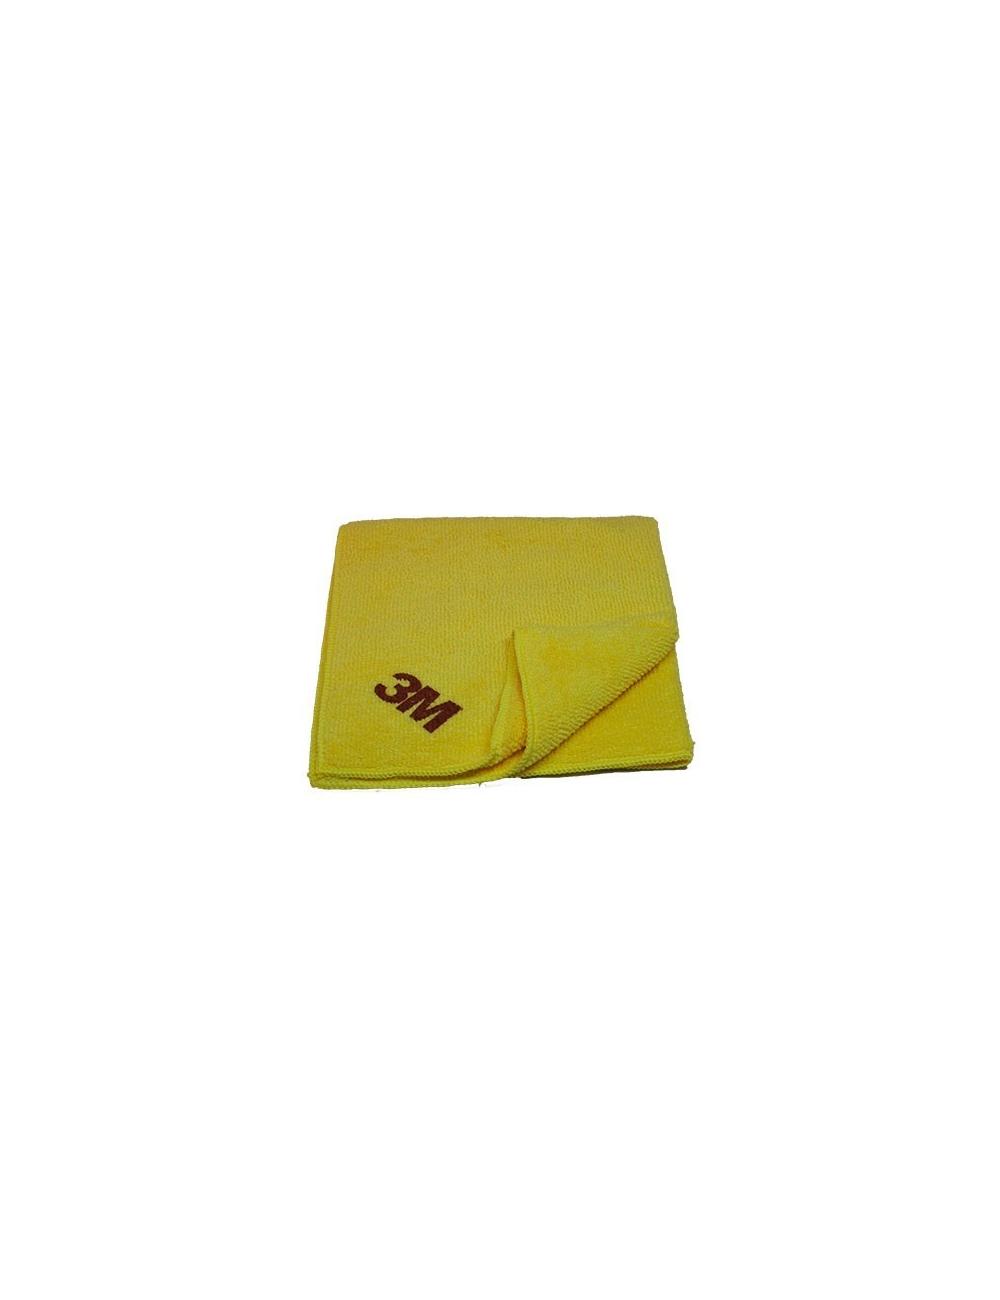 chiffon de lustrage optimum jaune 3m. Black Bedroom Furniture Sets. Home Design Ideas